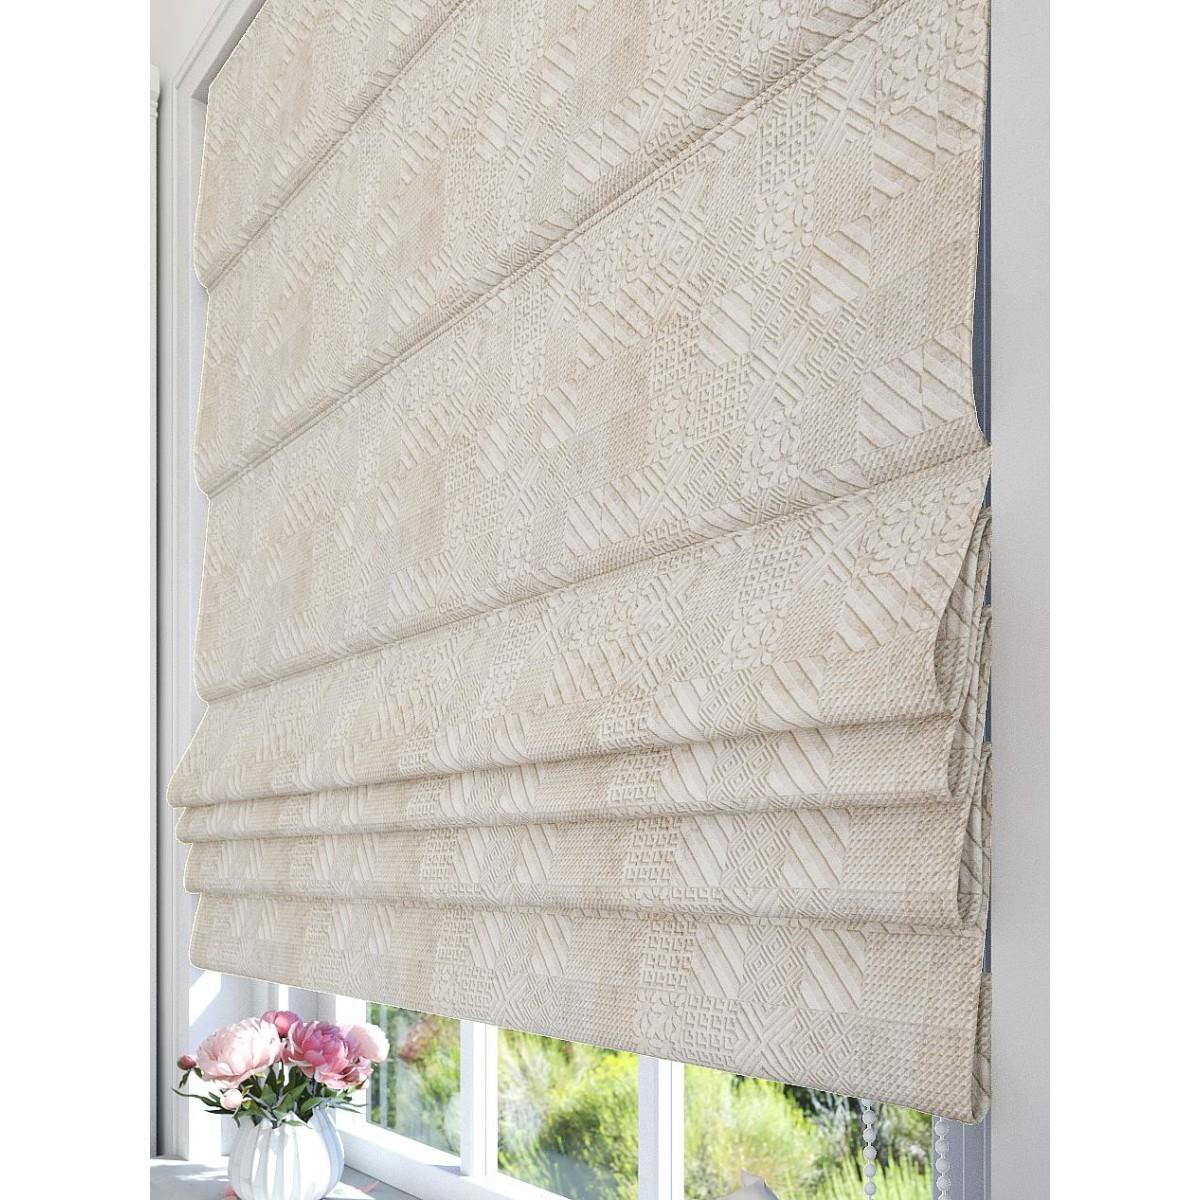 Римская штора ТомДом Лифорис 999167-001 170 см